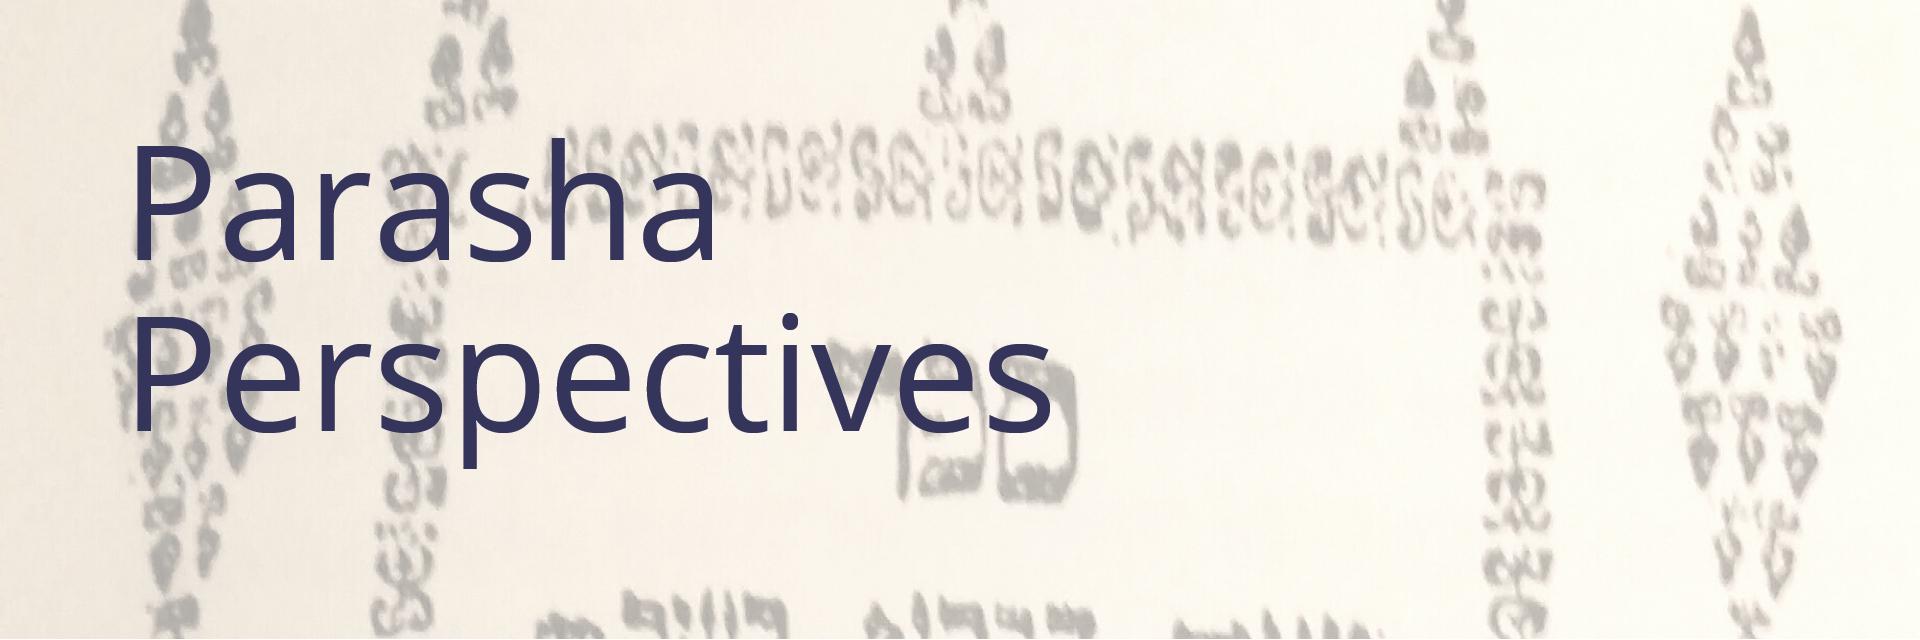 "<a href=""https://www.congkti.org/event/parasha-perspectives.html""                                     target="""">                                                                 <span class=""slider_title"">                                     Torah portion of the week.                                </span>                                                                 </a>                                                                                                                                                                                       <span class=""slider_description"">Lunch break with Rabbi Goldberg.</span>                                                                                     <a href=""https://www.congkti.org/event/parasha-perspectives.html"" class=""slider_link""                             target="""">                             Learn more here...                            </a>"